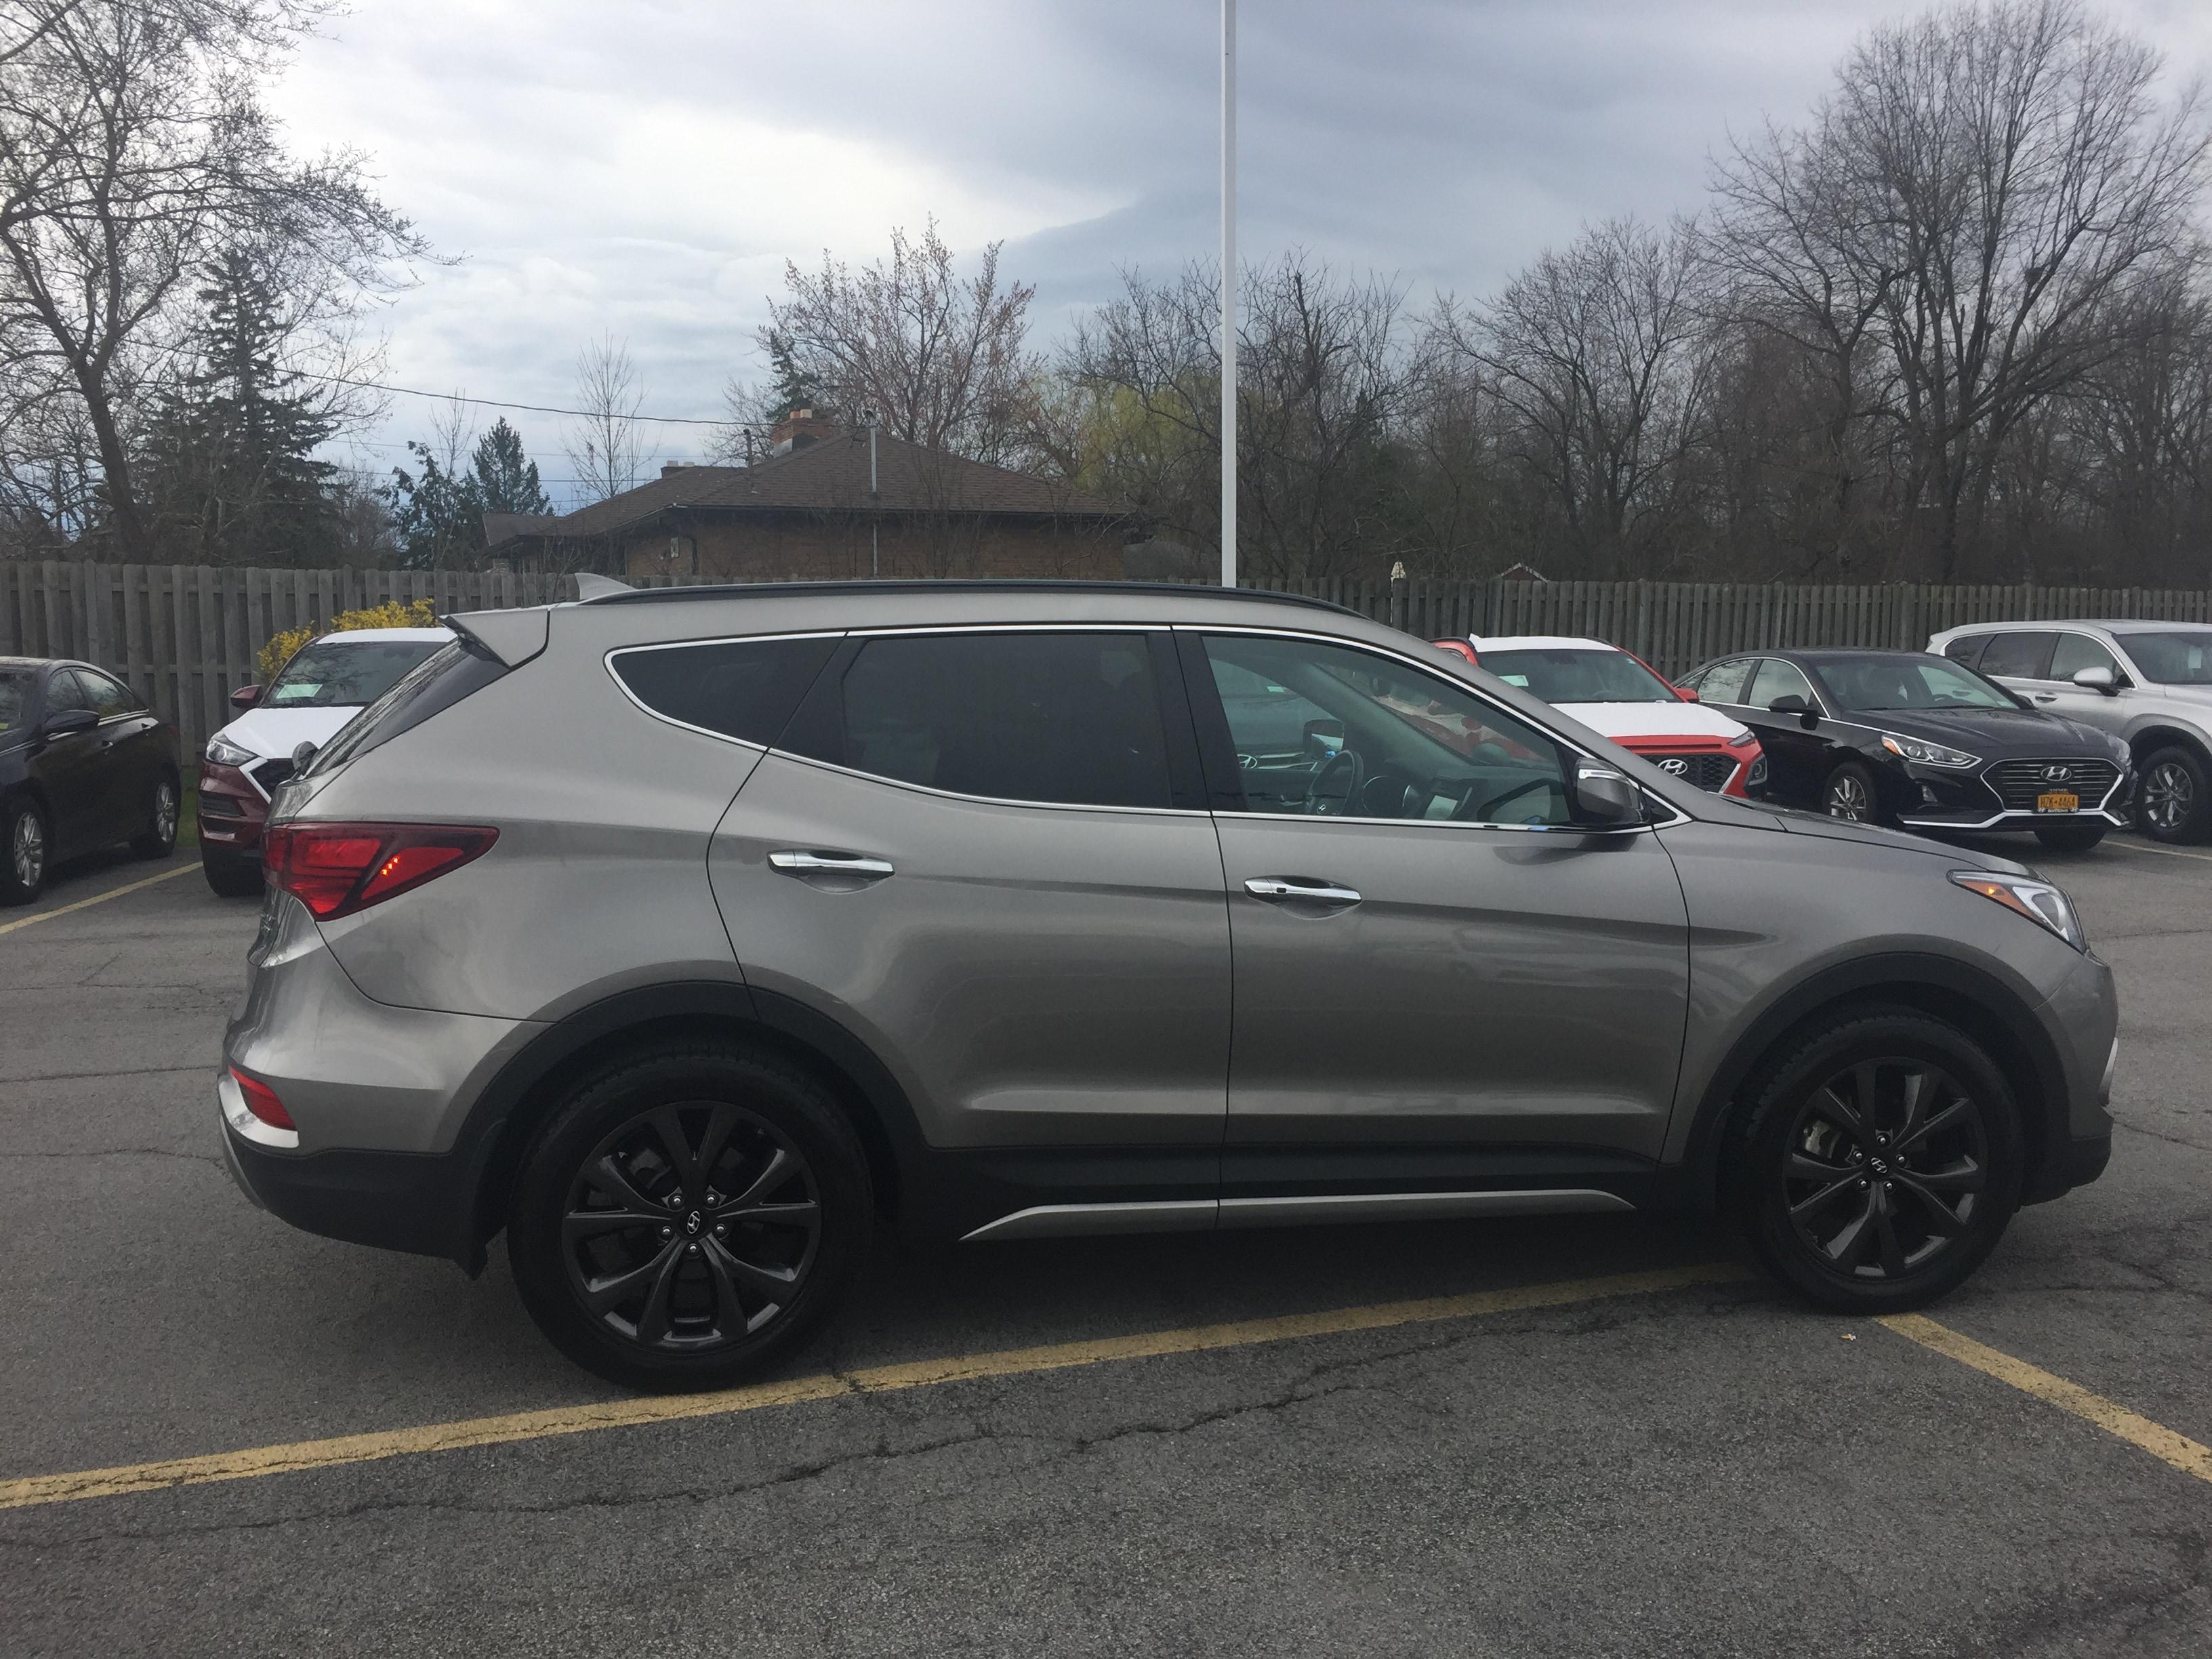 Buffalo Certified Used 2018 Hyundai Santa Fe Sport for Sale in